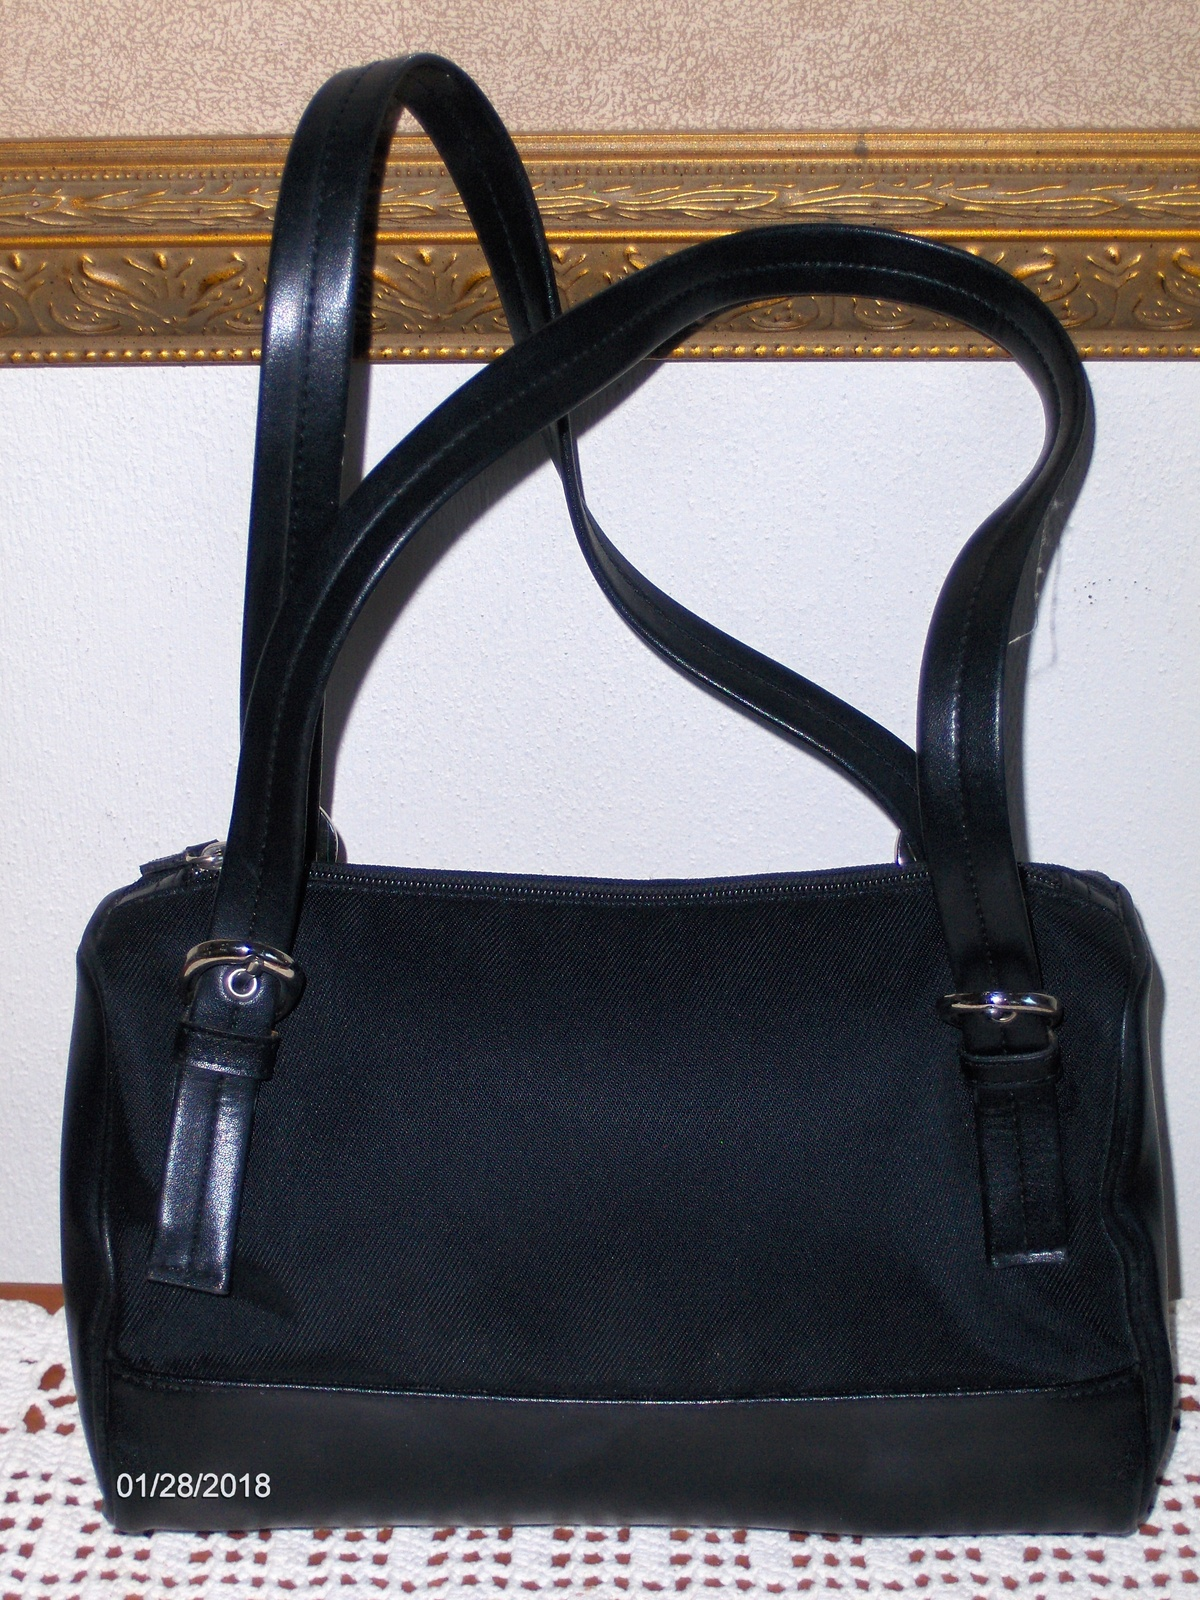 City Dkny Satchel Black Leather Handbag Purse Tote Bag 13 62 Gbp